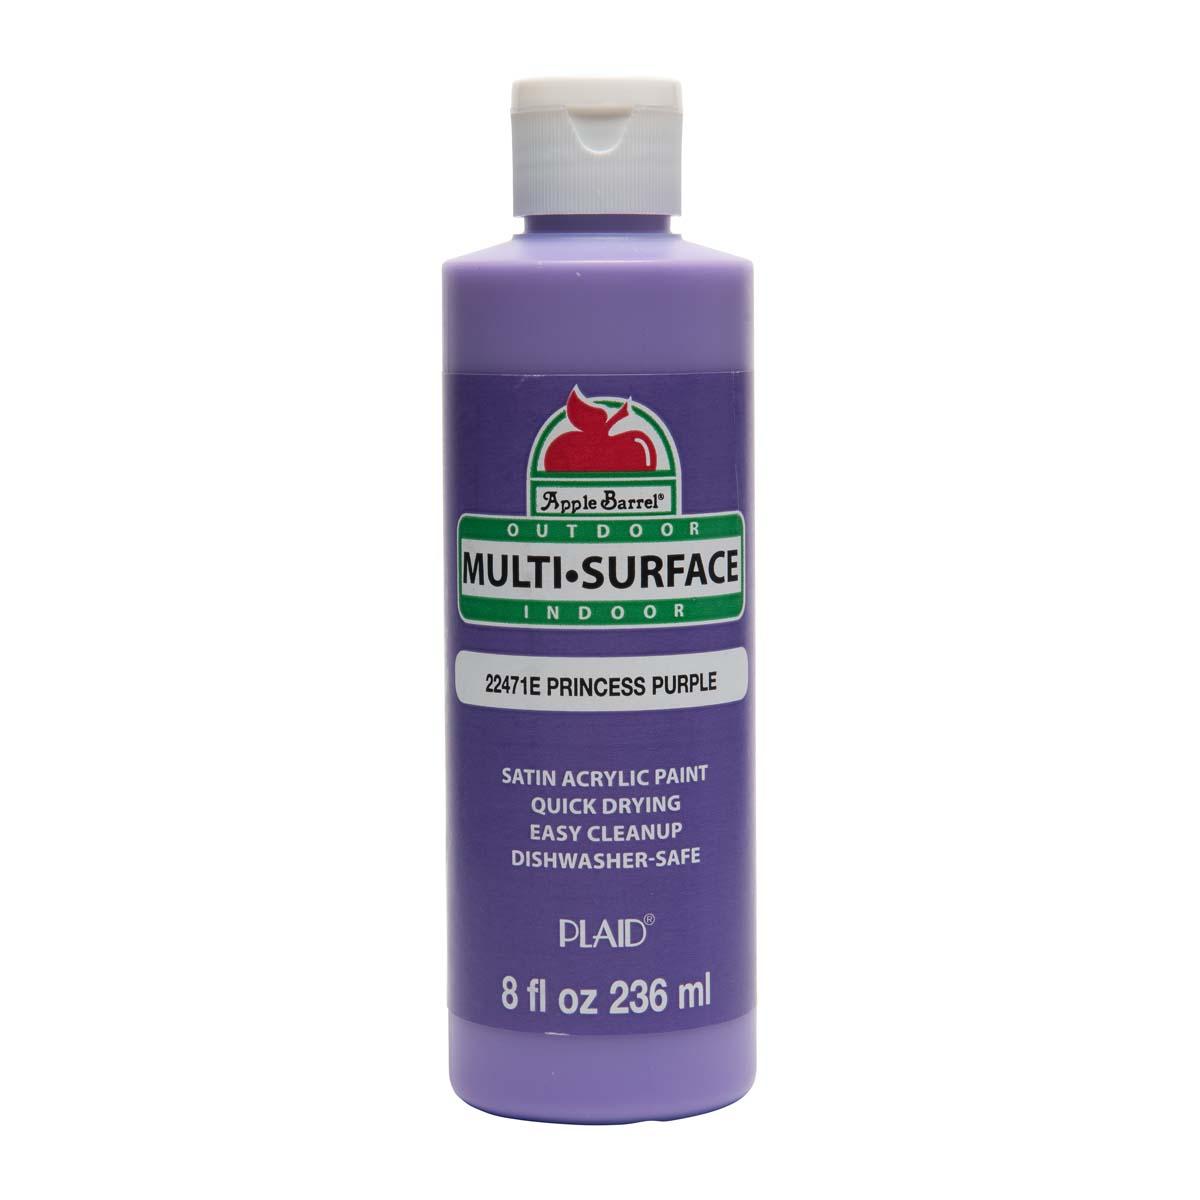 Apple Barrel ® Multi-Surface Satin Acrylic Paints - Princess Purple, 8 oz.